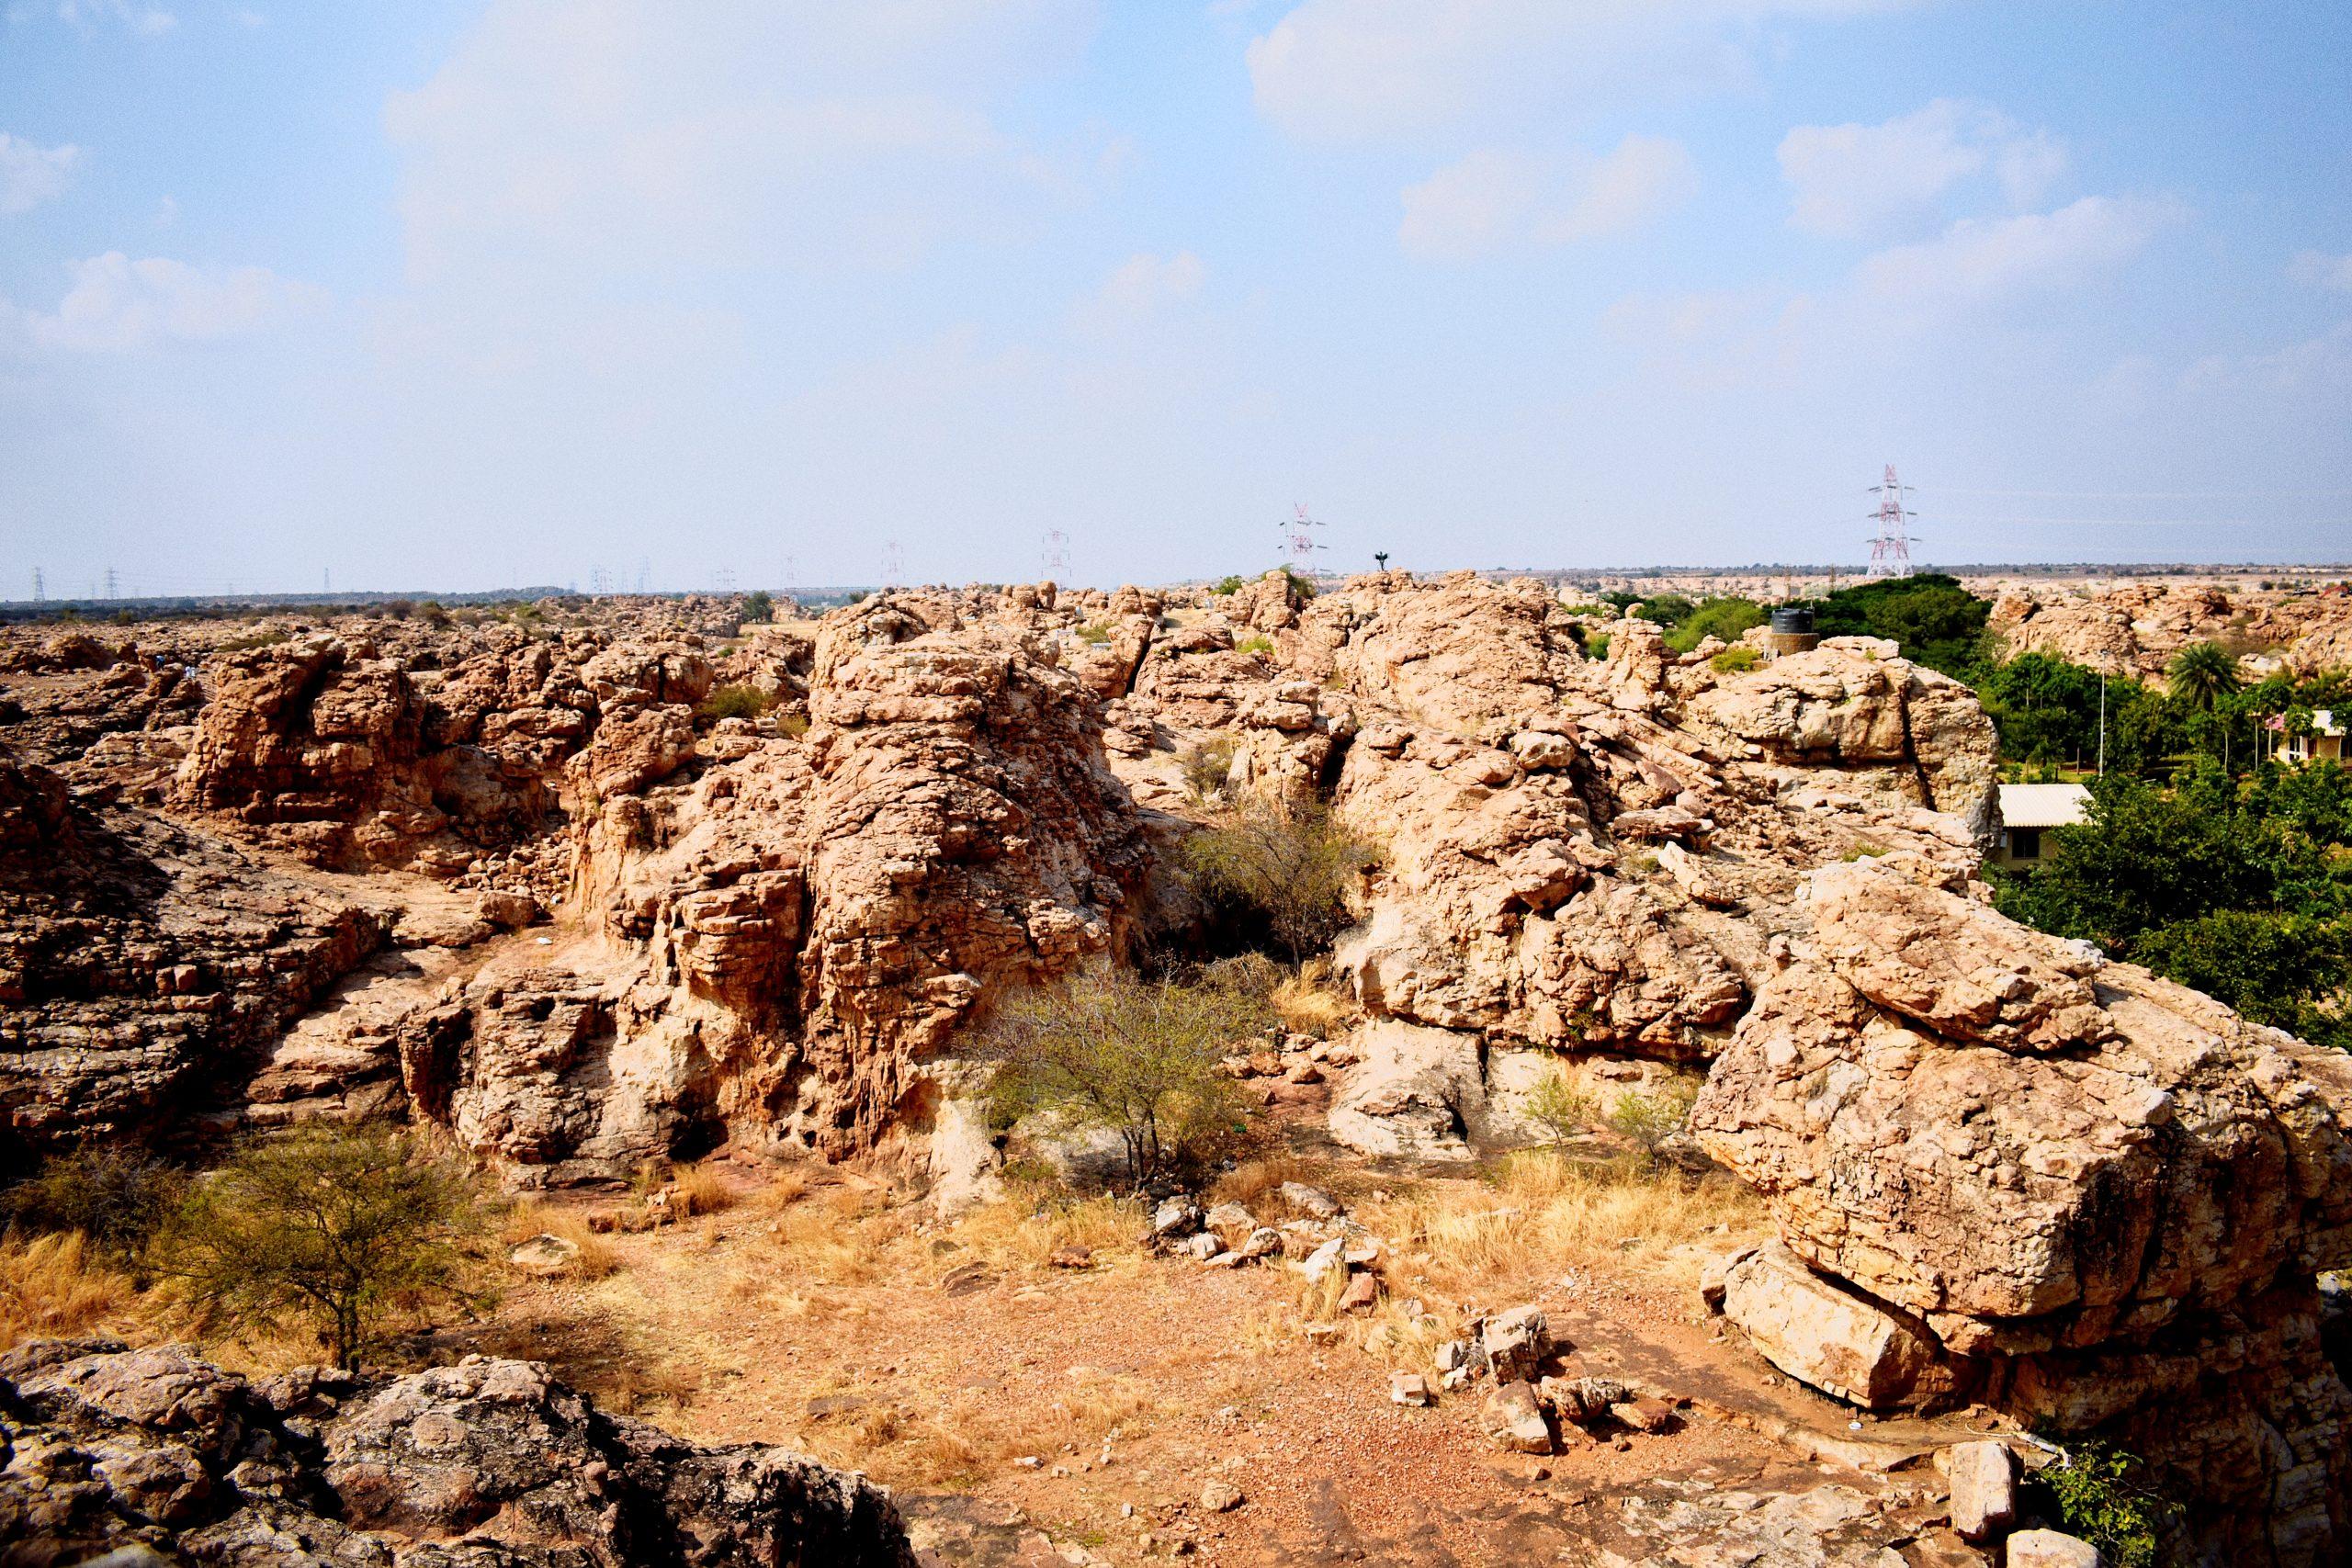 Landscape of a rock formation